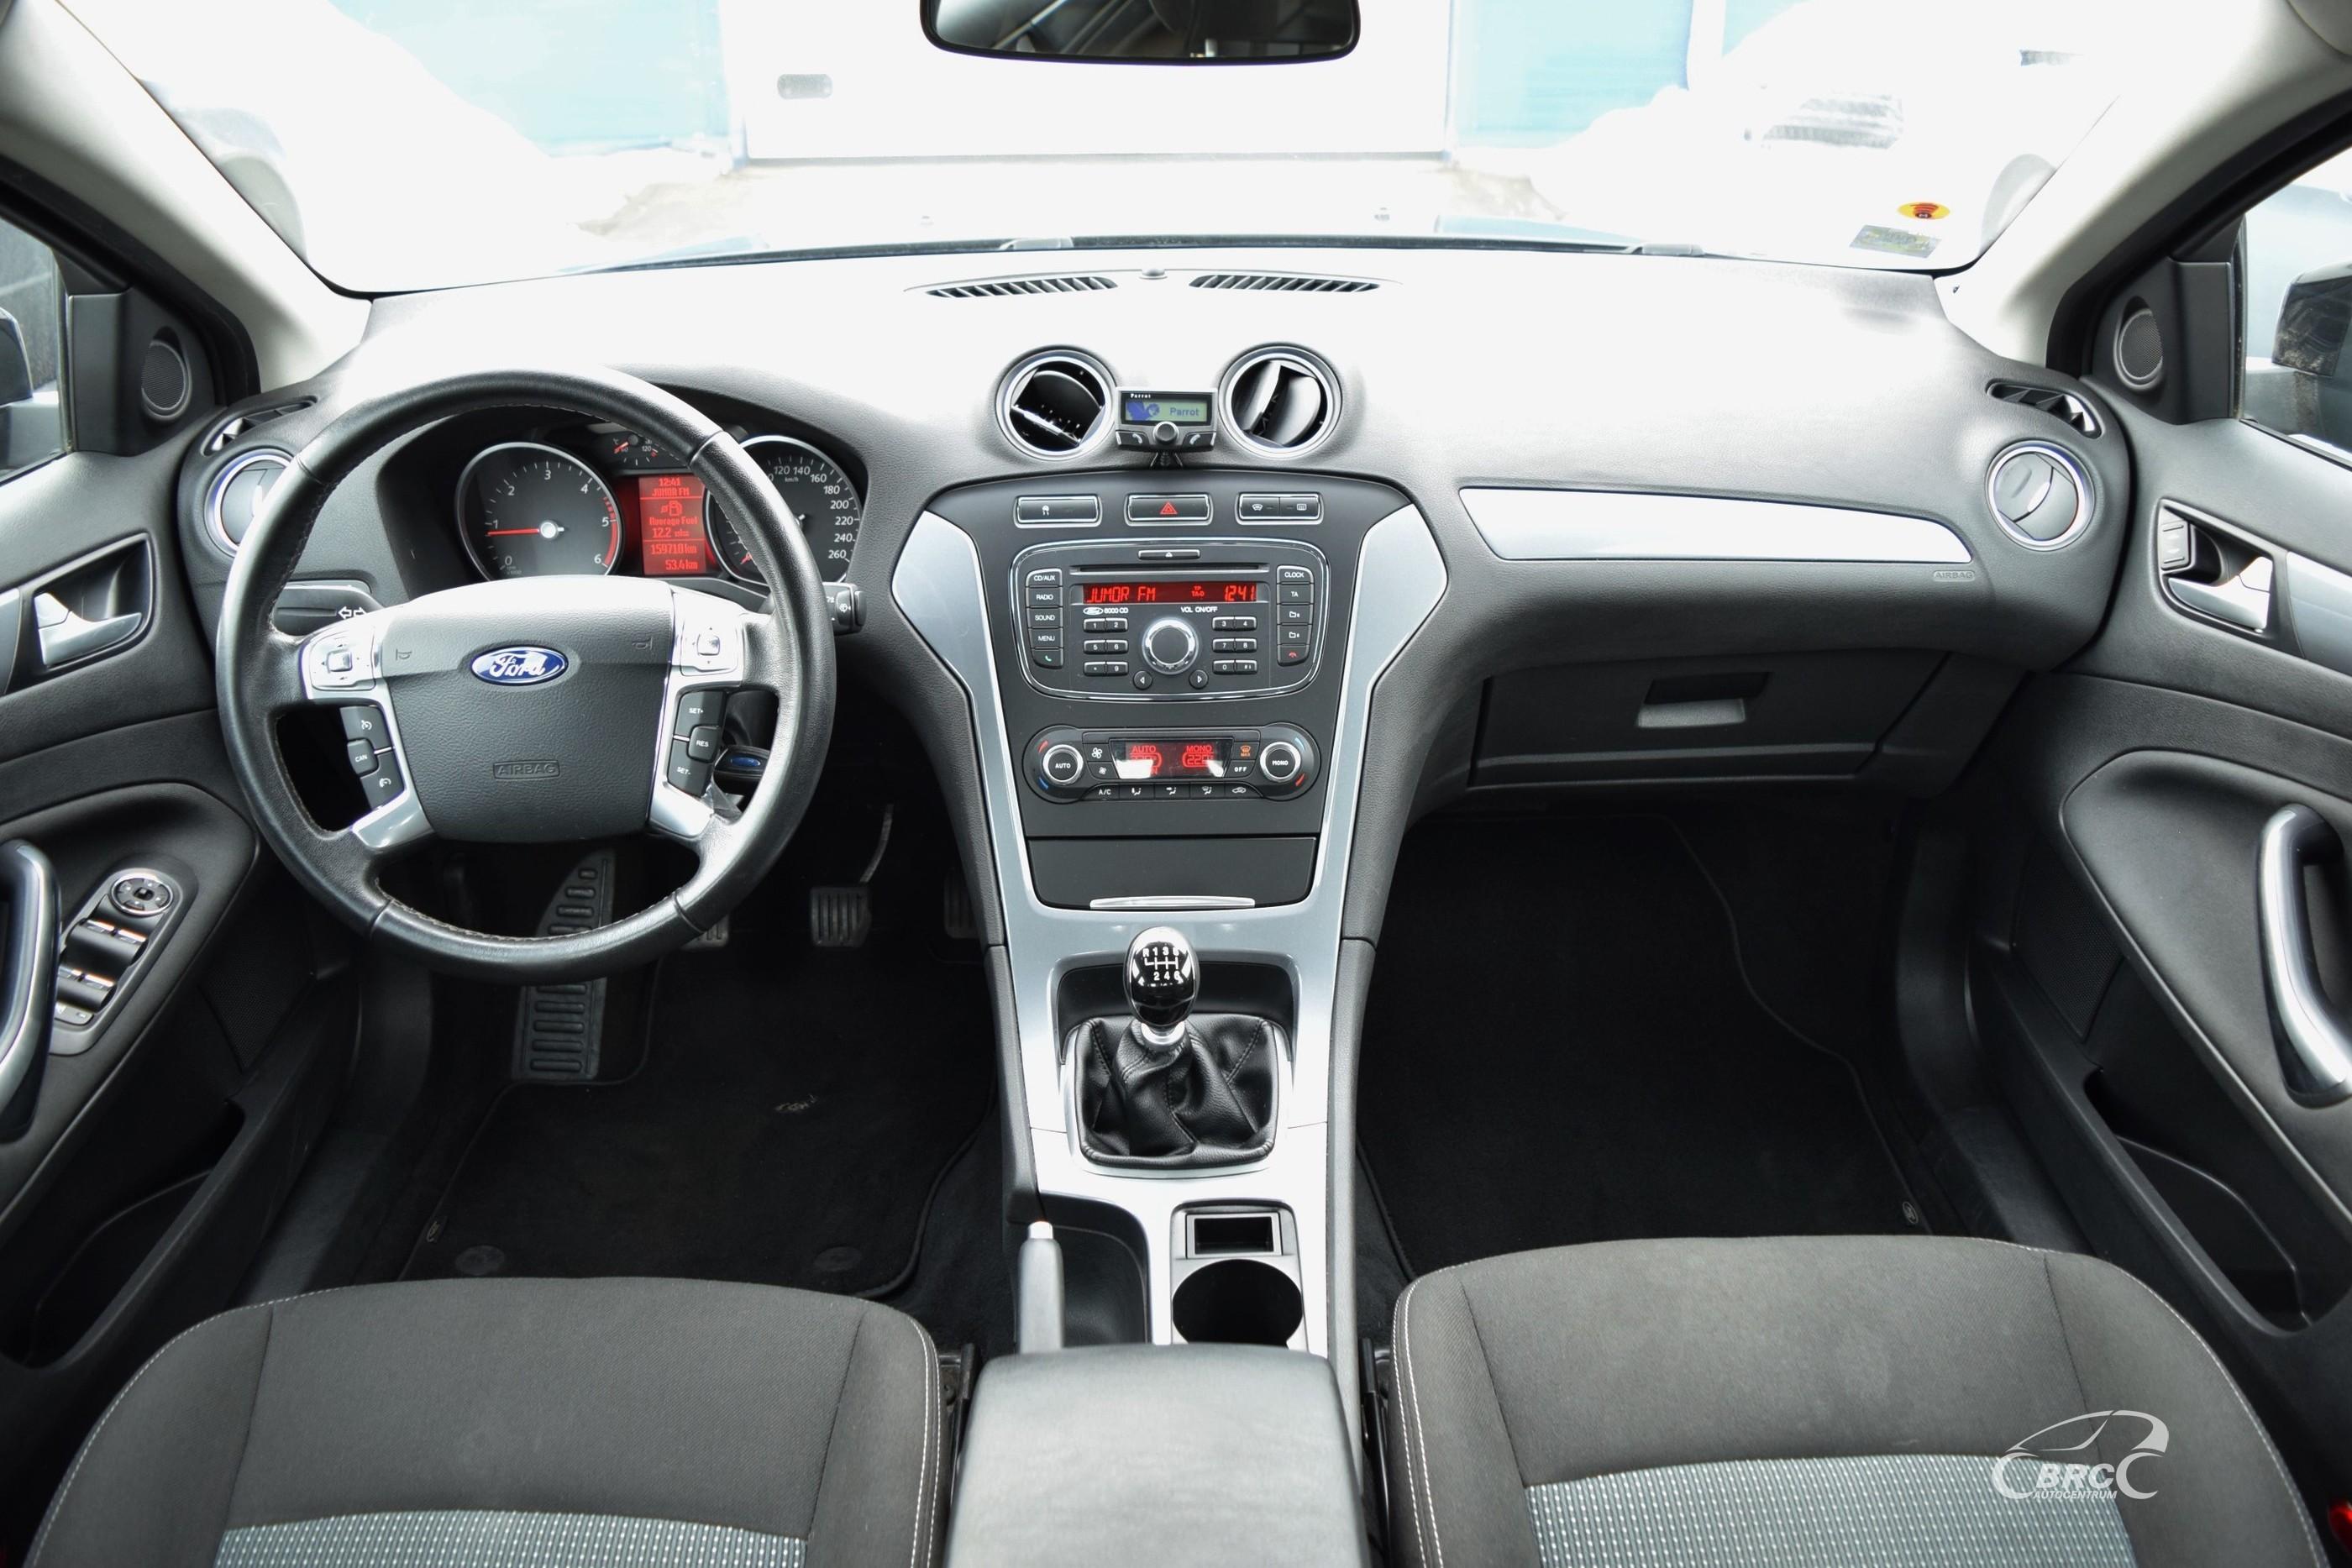 Ford Mondeo Duratorq TDCi M/T